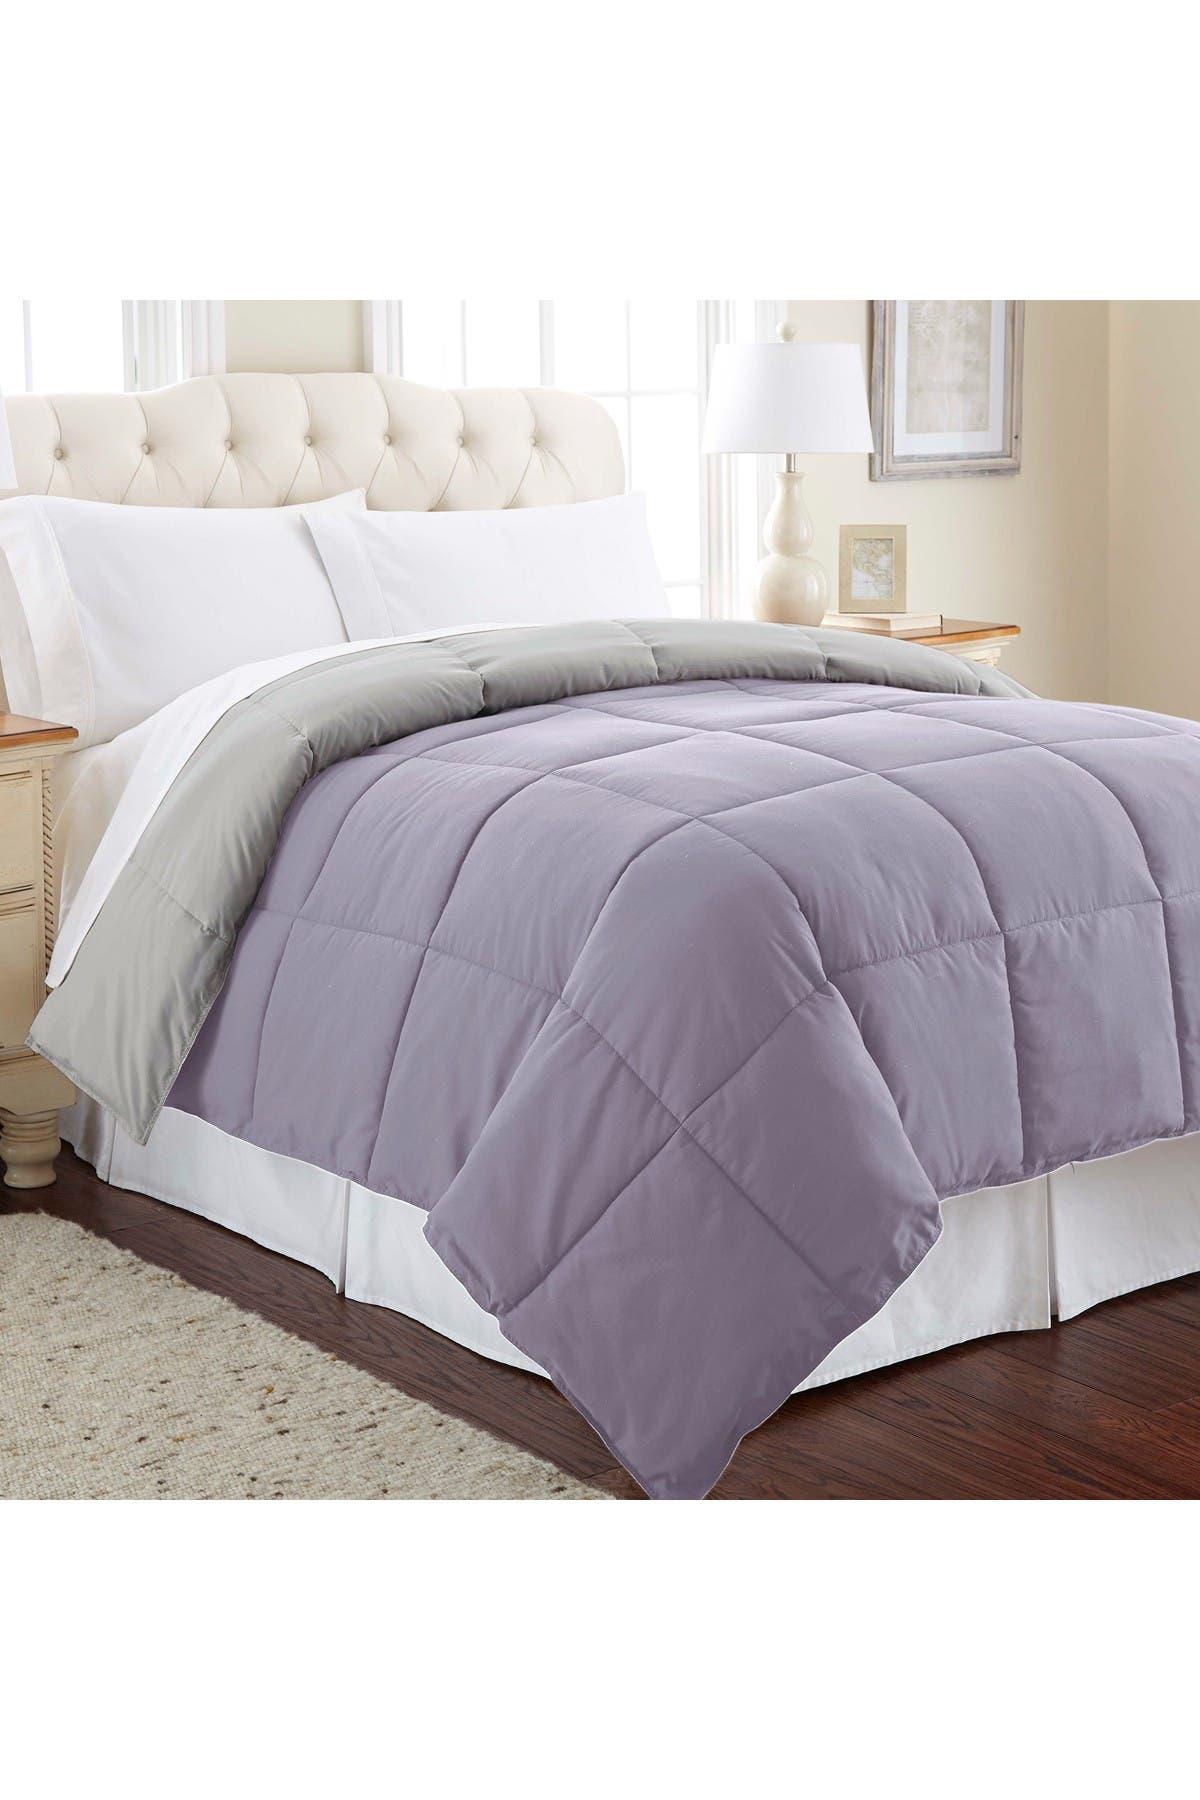 Image of Modern Threads Queen Down Alternative Reversible Comforter - Amethyst/Silver